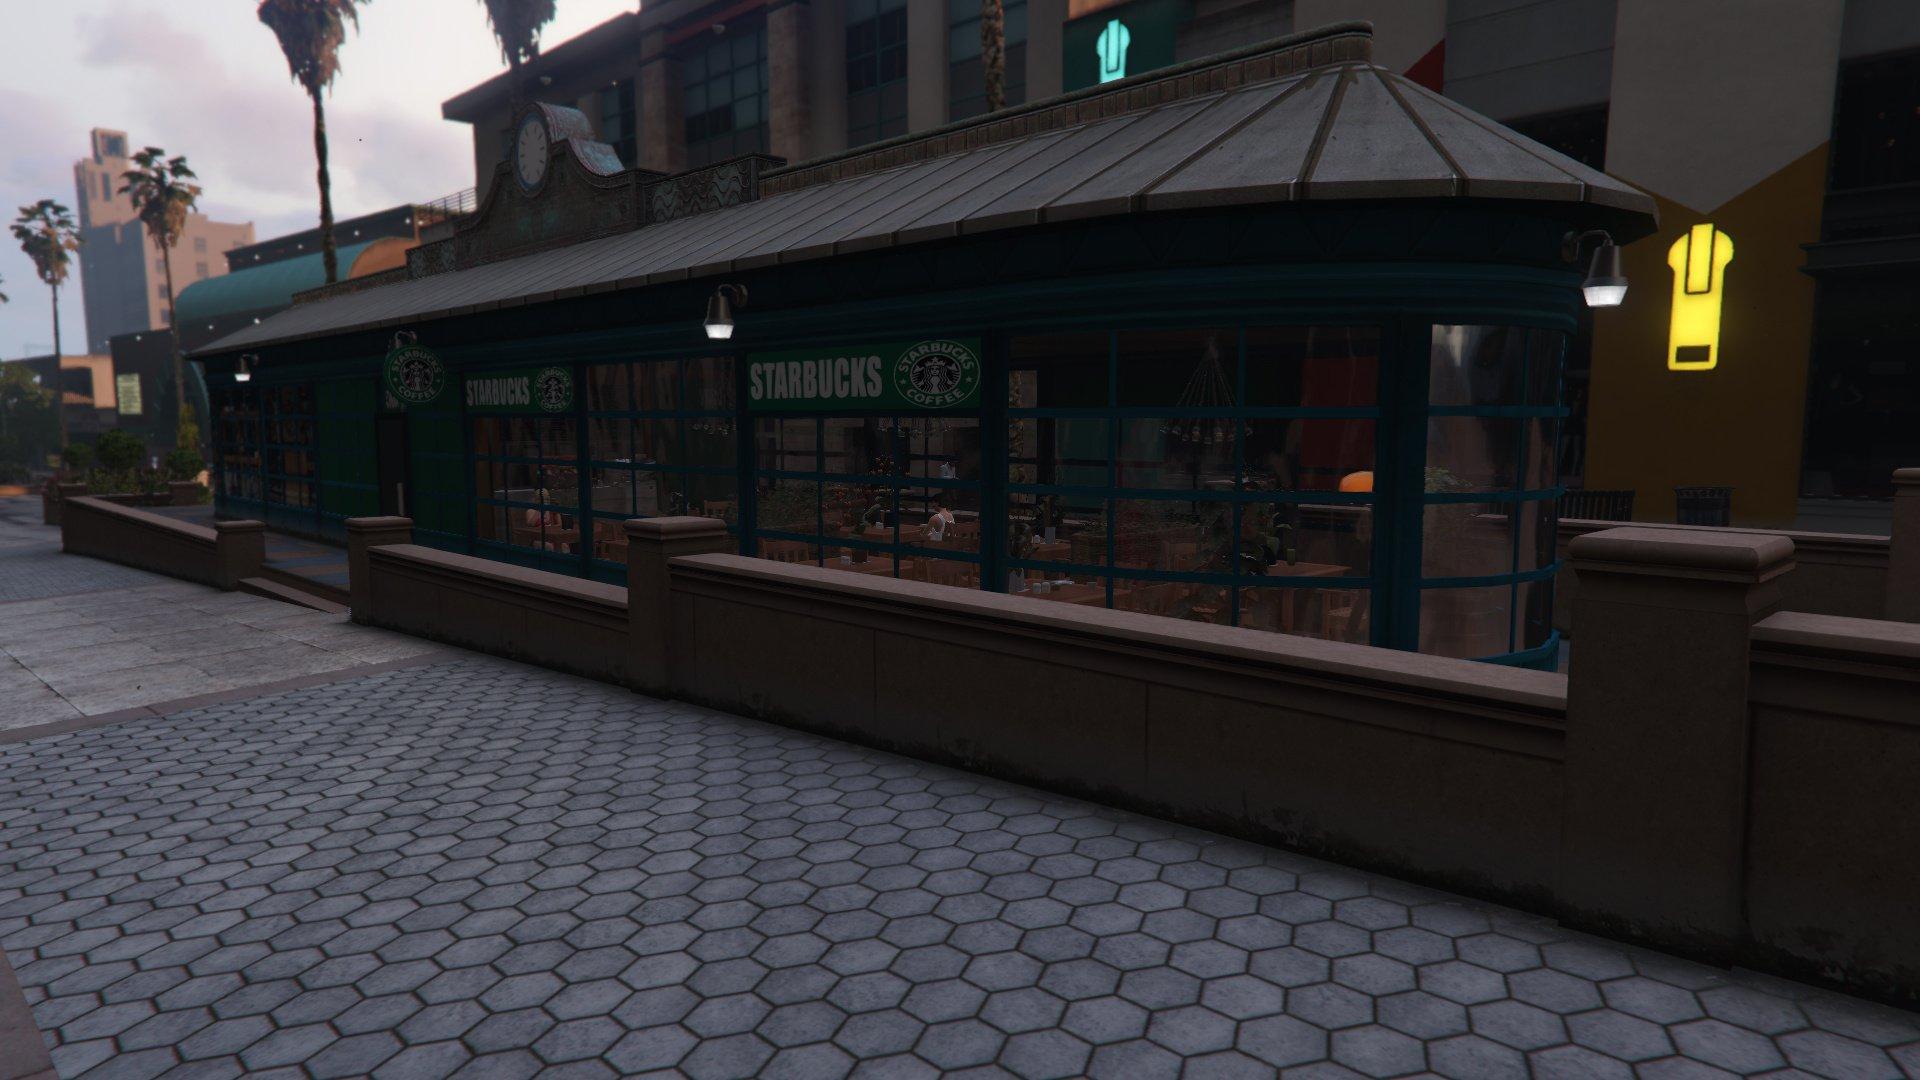 Starbucks Coffee And Cafe Interior YMAP